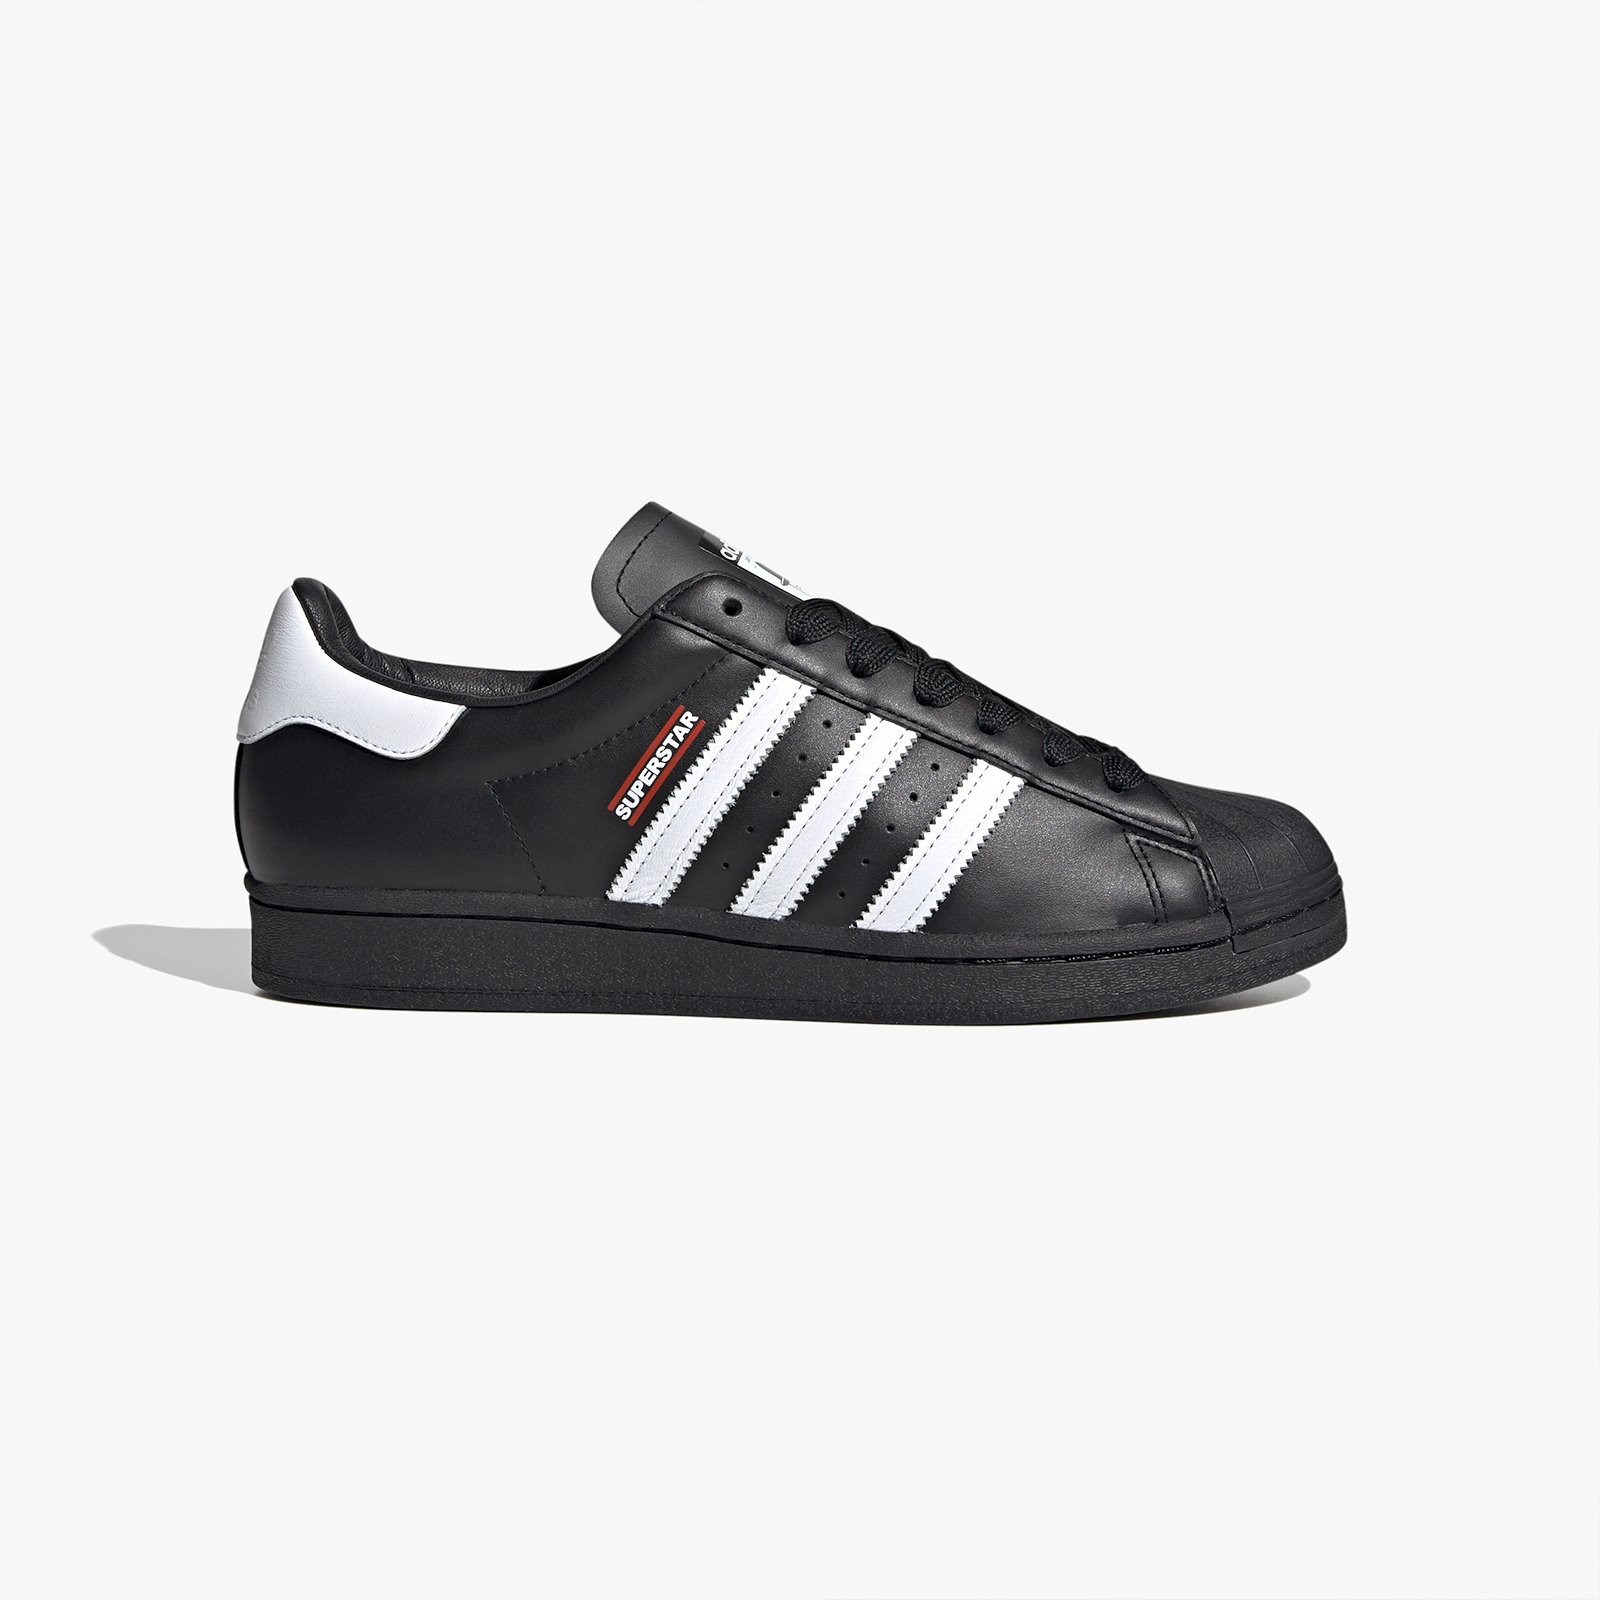 adidas SUPERSTAR 50 RUN DMC - Fx7617 - SNS | sneakers & streetwear ...